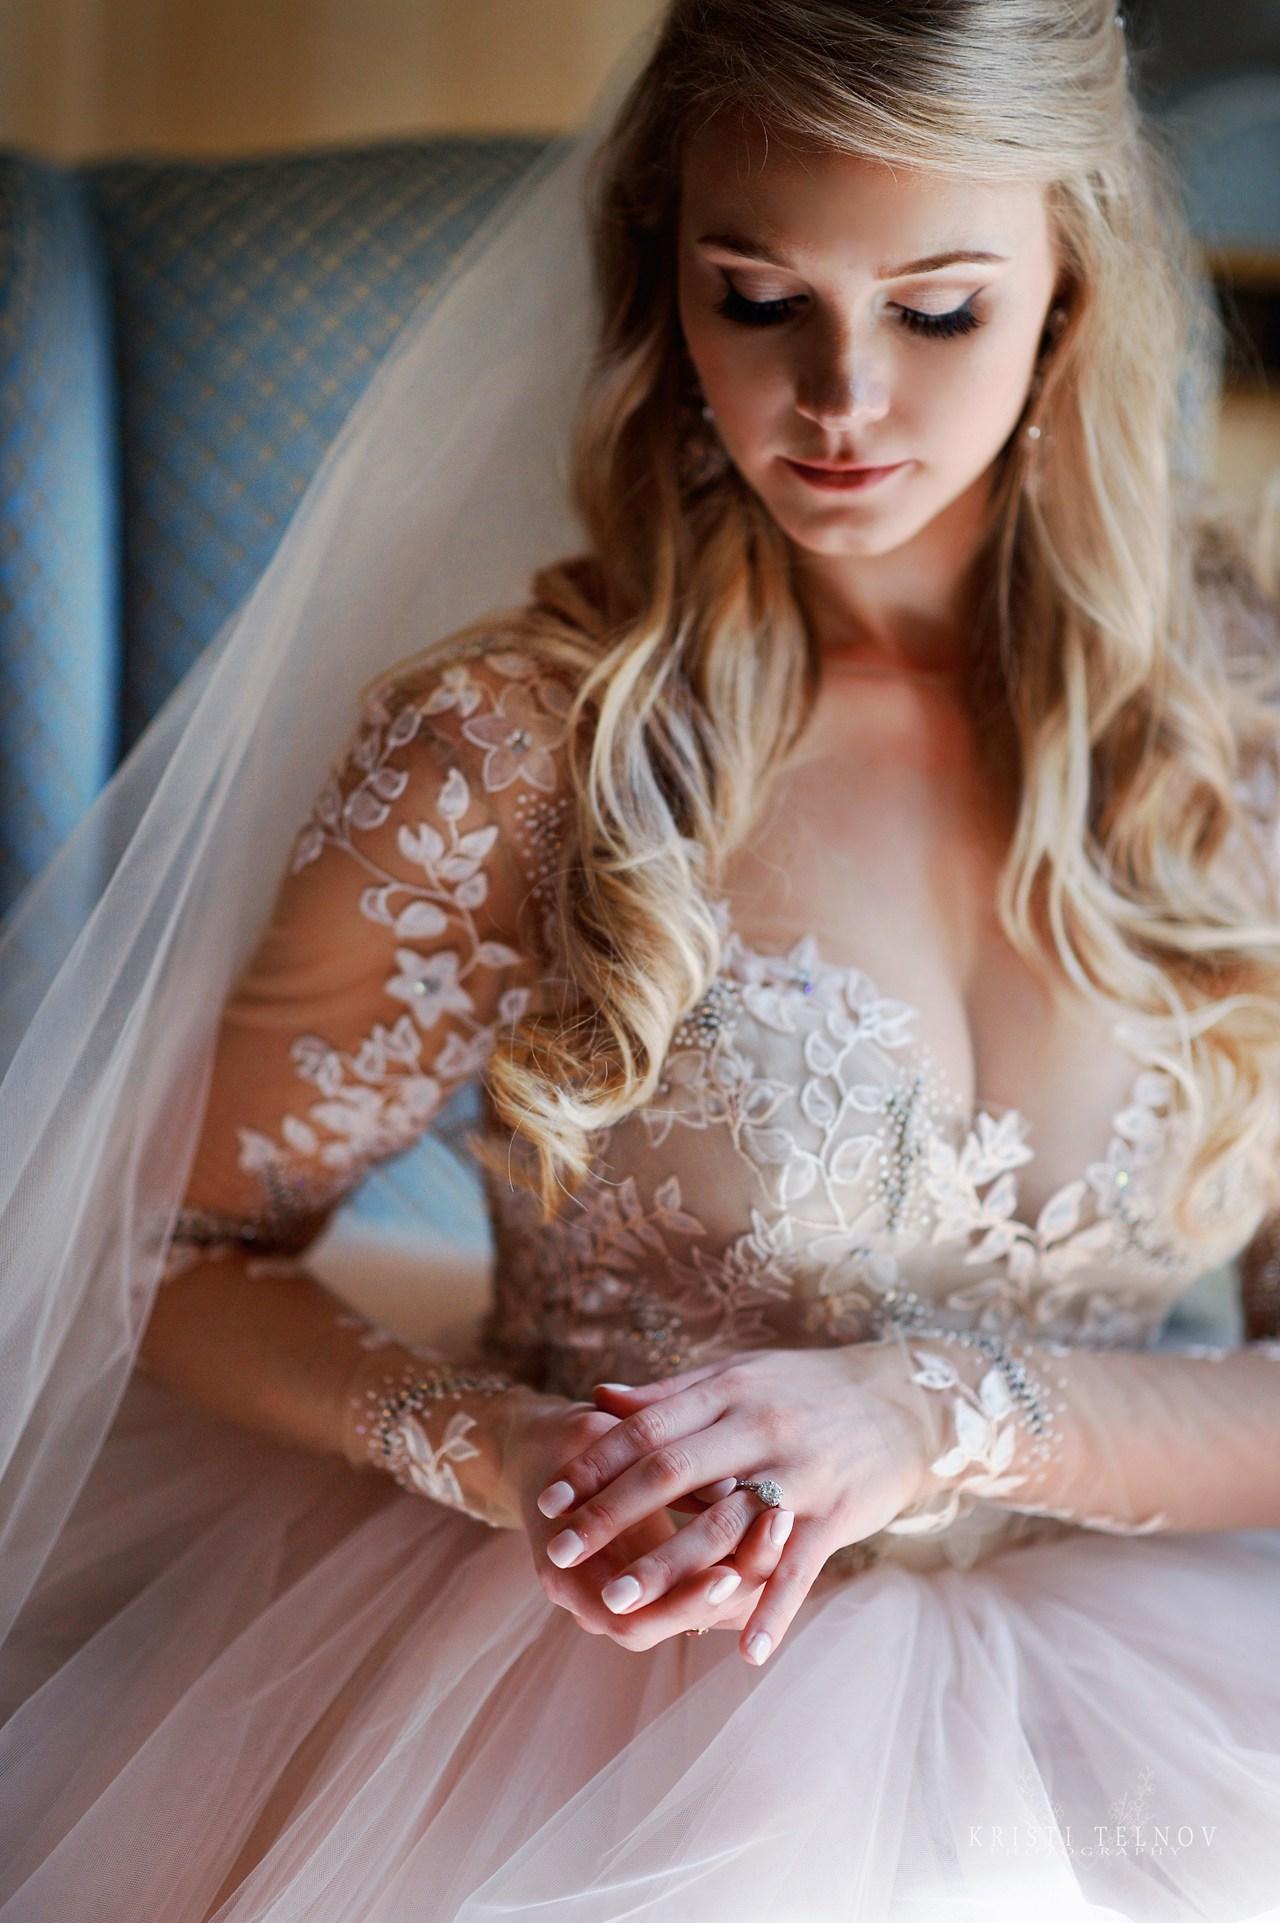 Piitsburgh-Wedding-Photo027-2.jpg